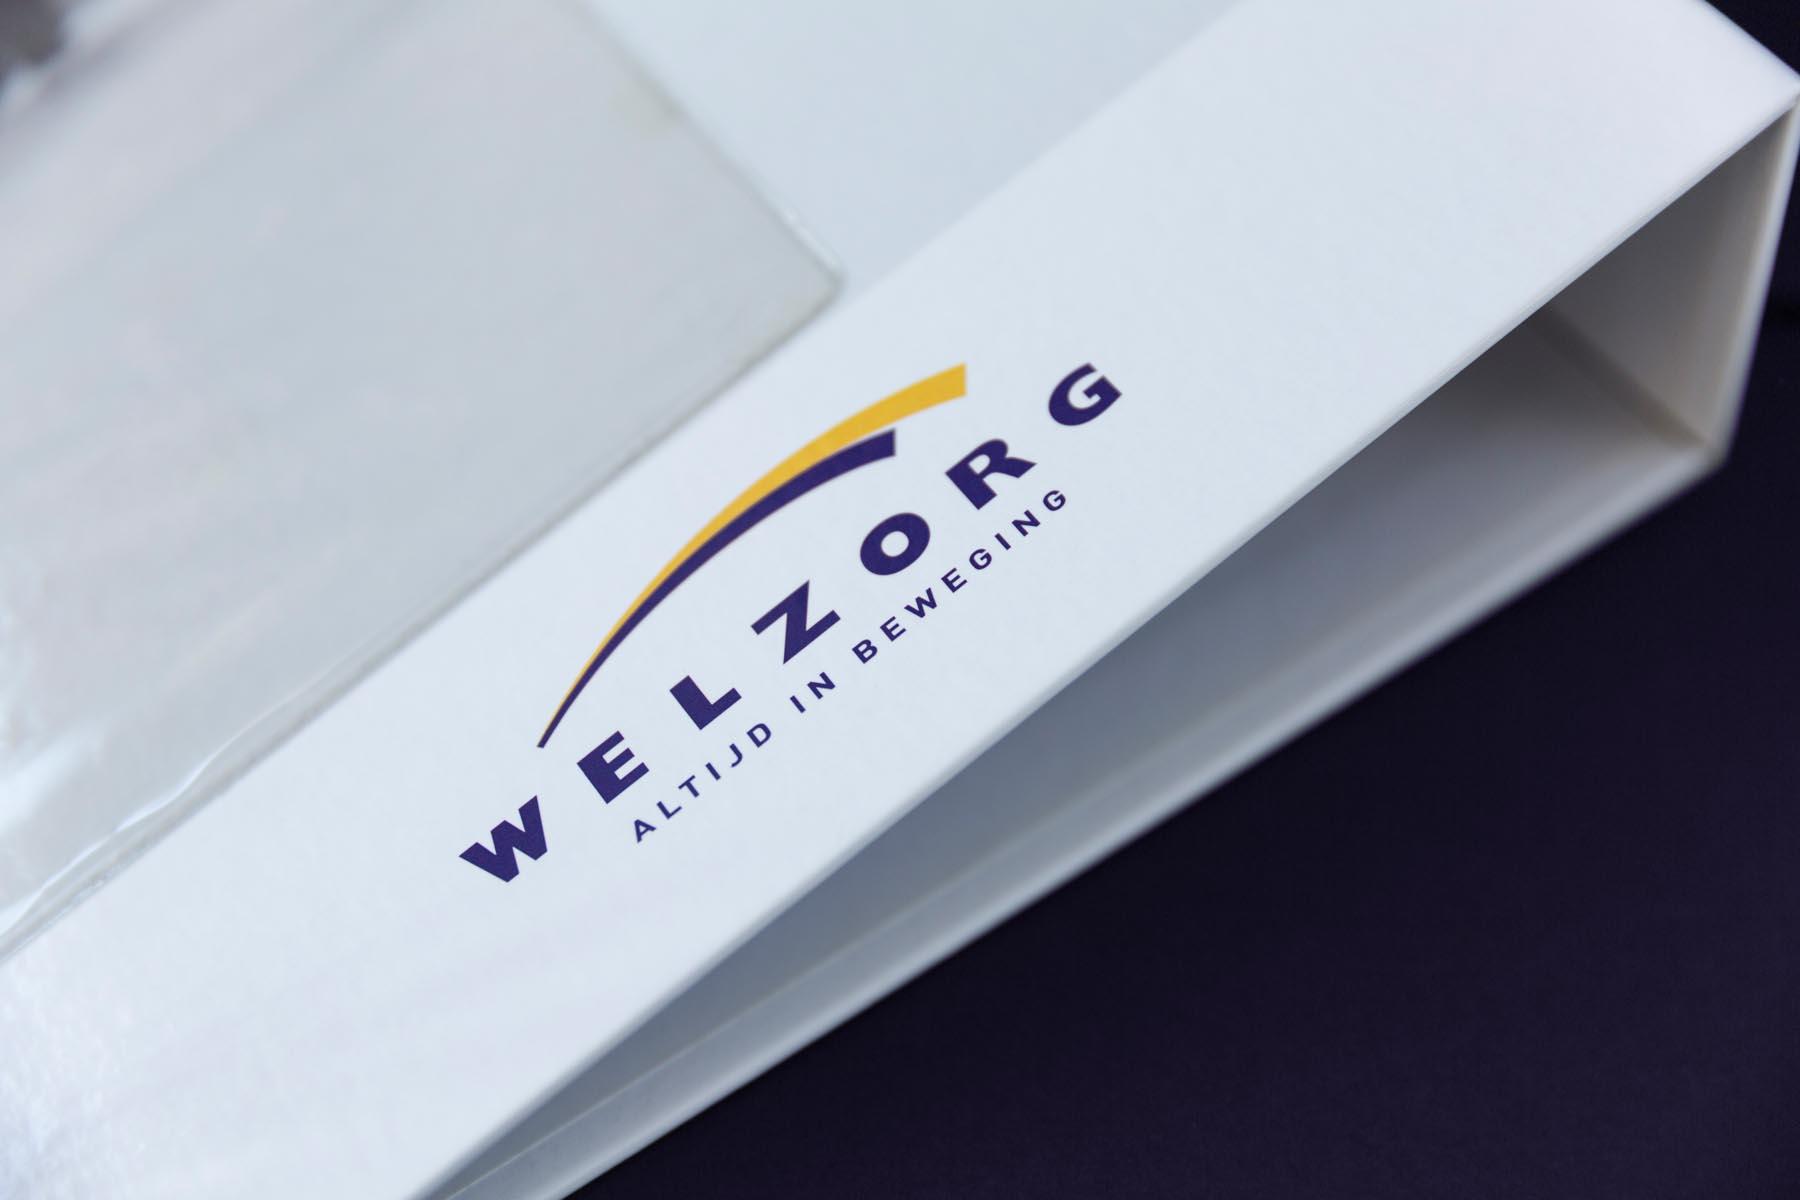 Ringband Welzorg